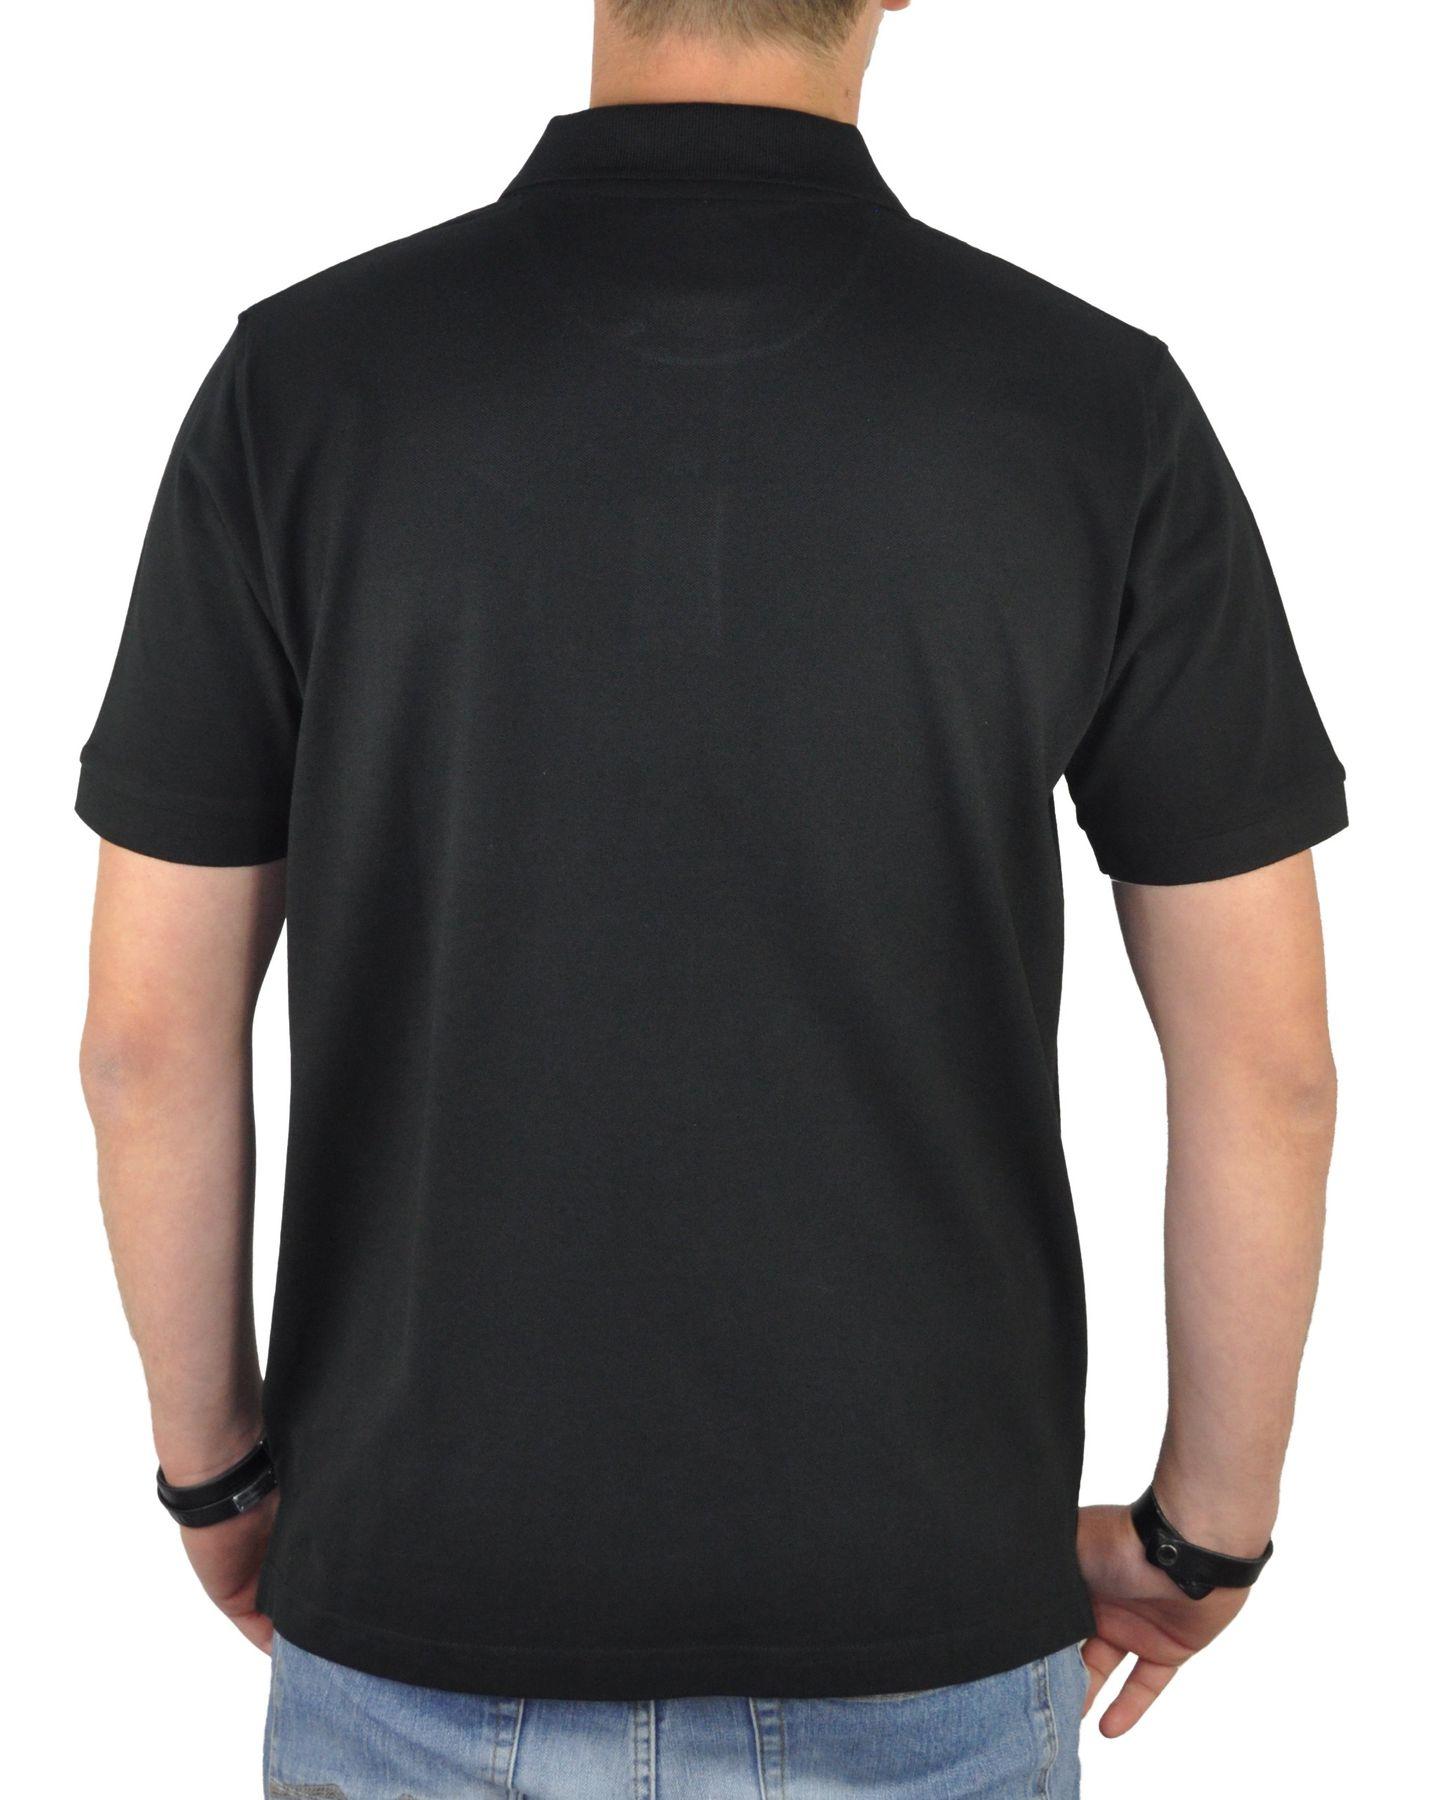 KITARO - Herren Poloshirt in verschiedenen Farben (68800) – Bild 2